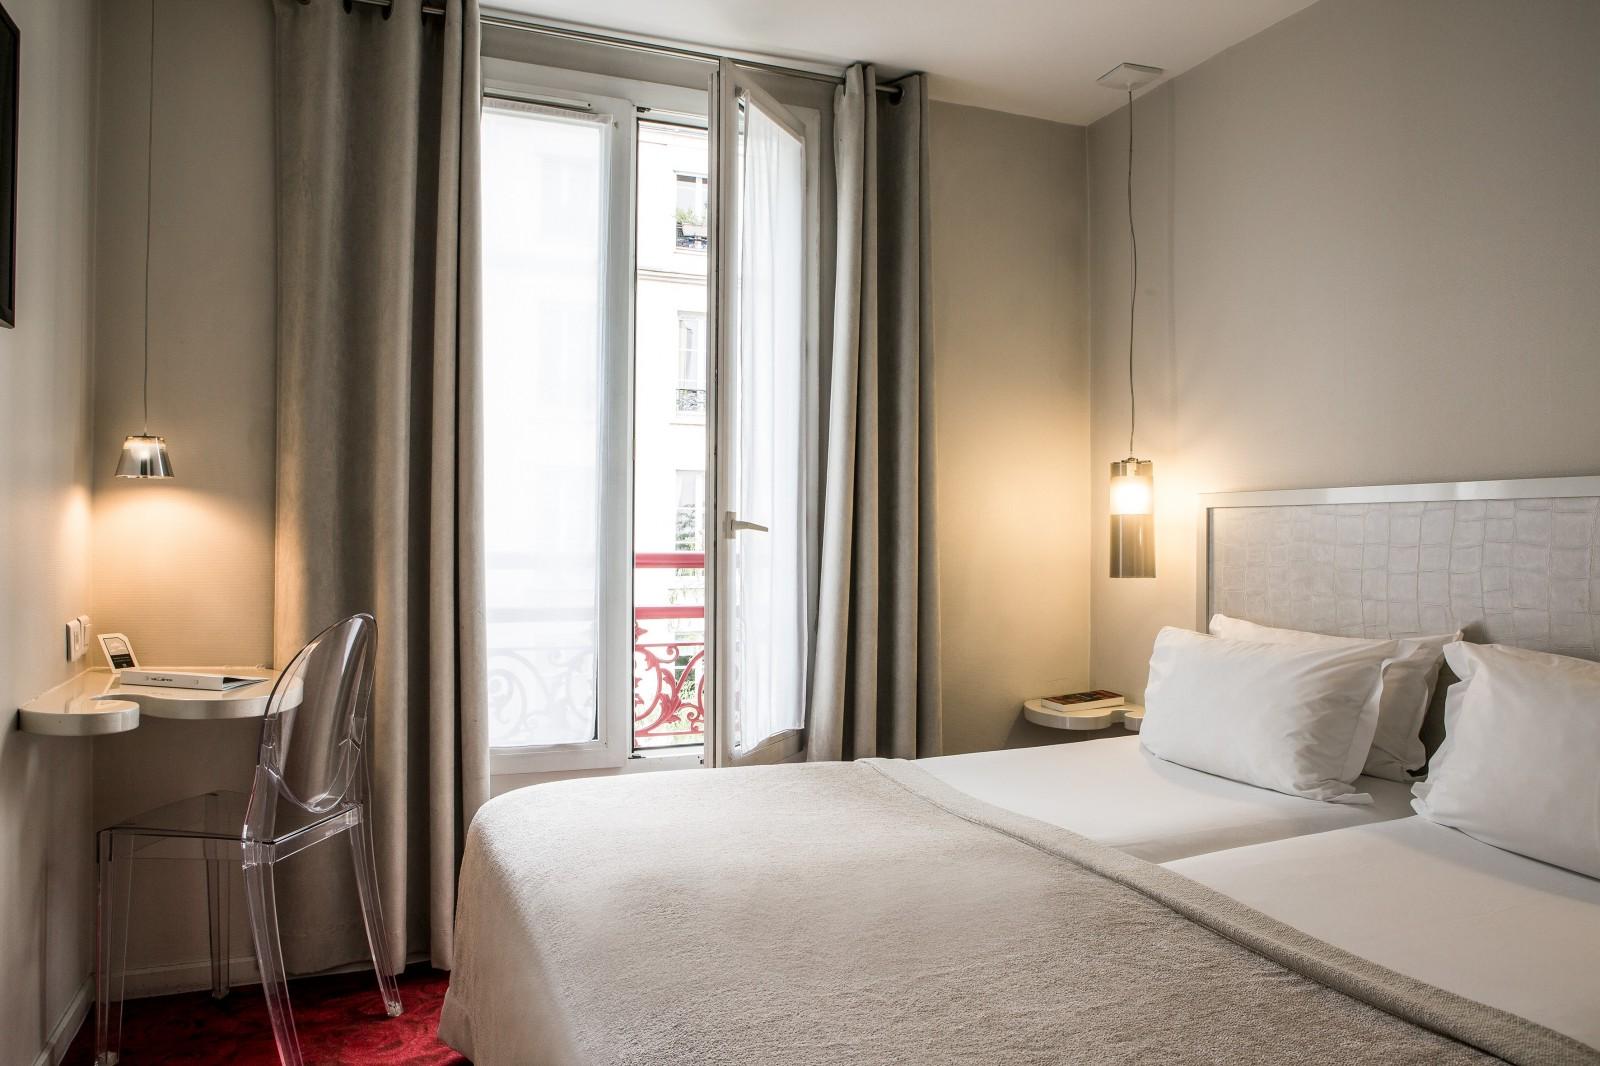 Hotel le quartier bercy square design hotel paris 12 for Hotel design bs as